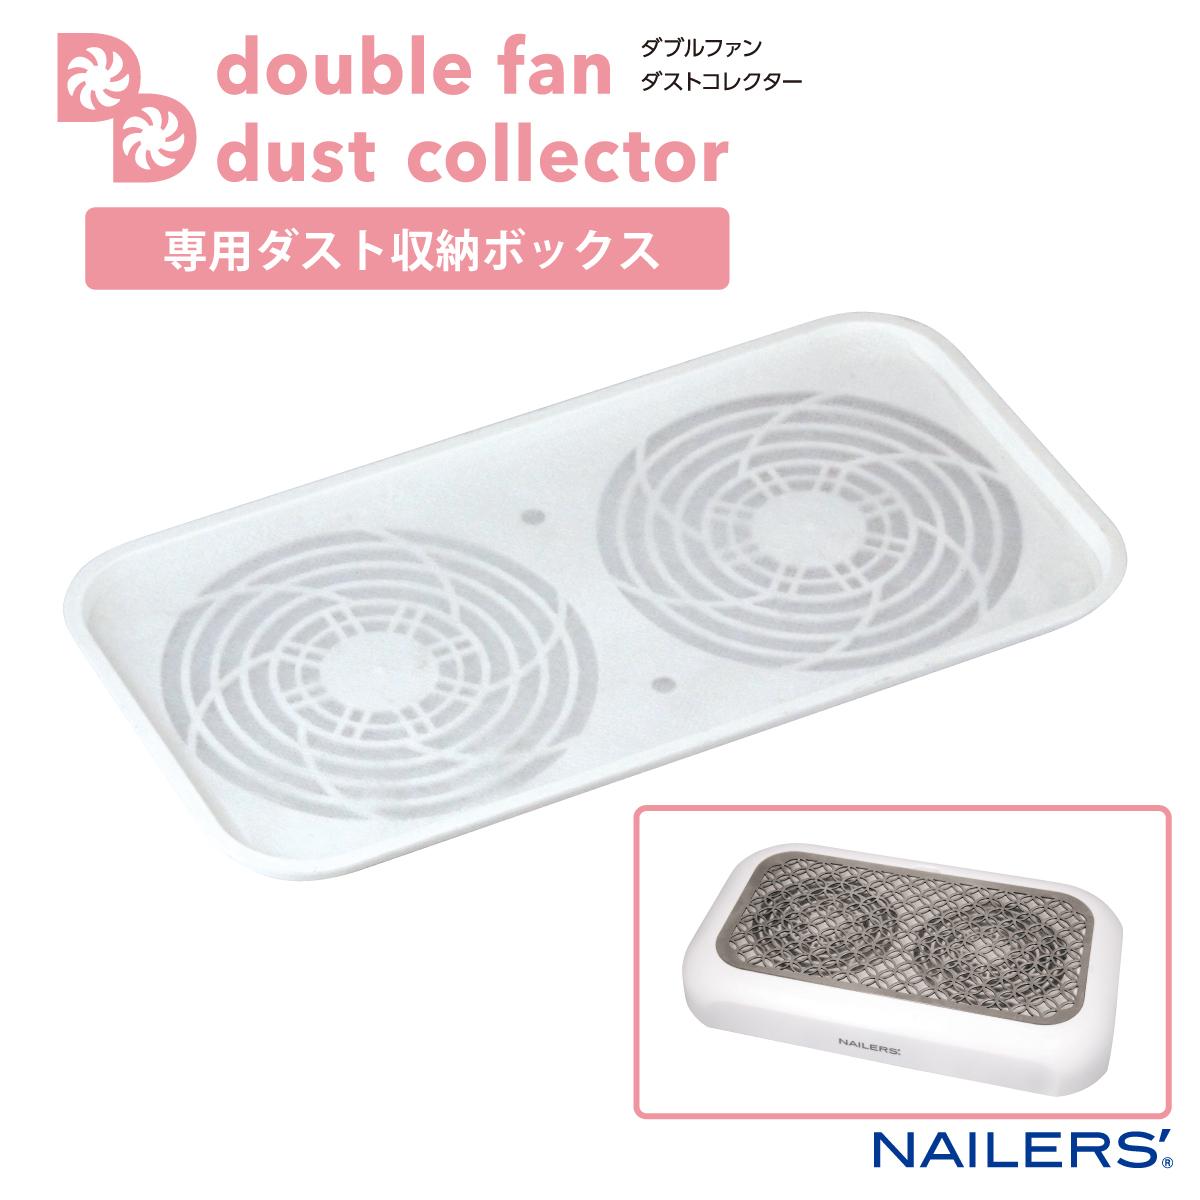 NAILERS' ダブルファンダストコレクター専用ダスト収納ボックス(WFD-2)画像